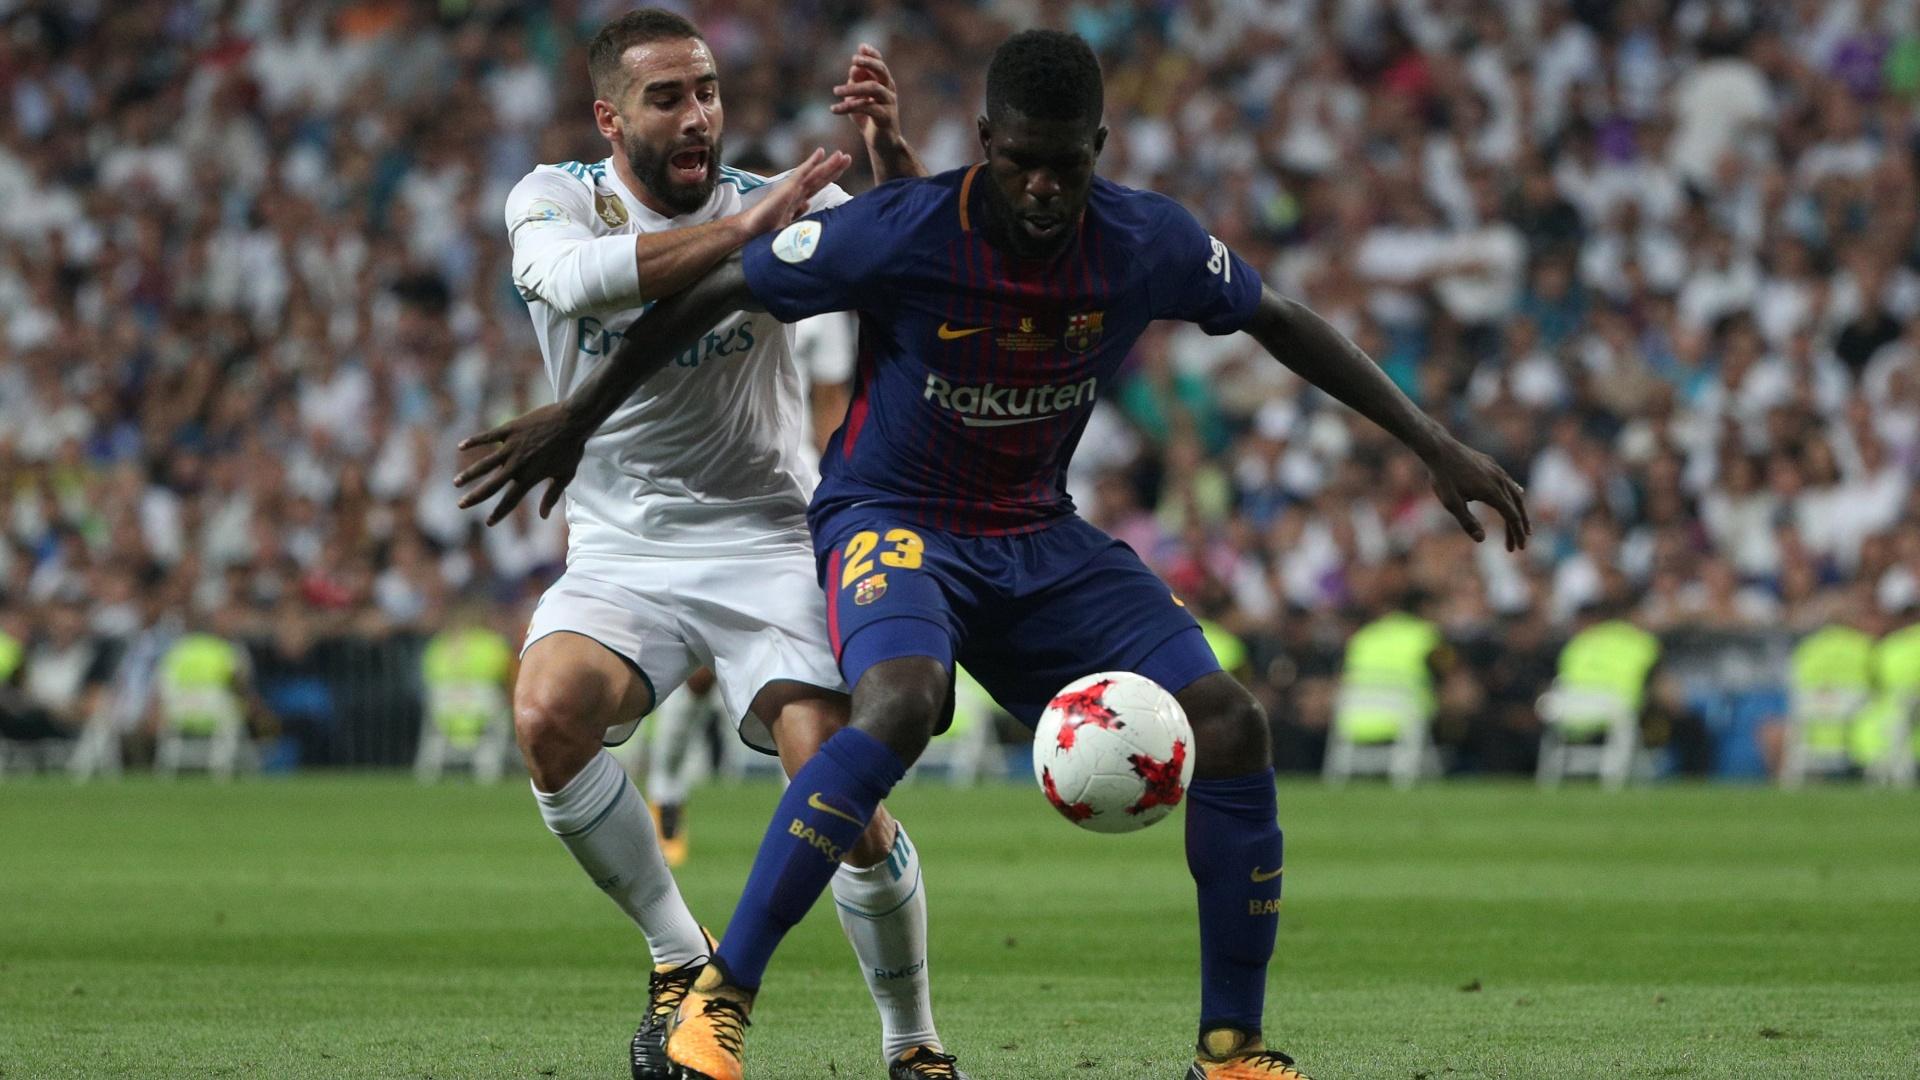 Carvajal tenta roubar a bola de Umtiti, durante a partida entre Real Madrid e Barcelona